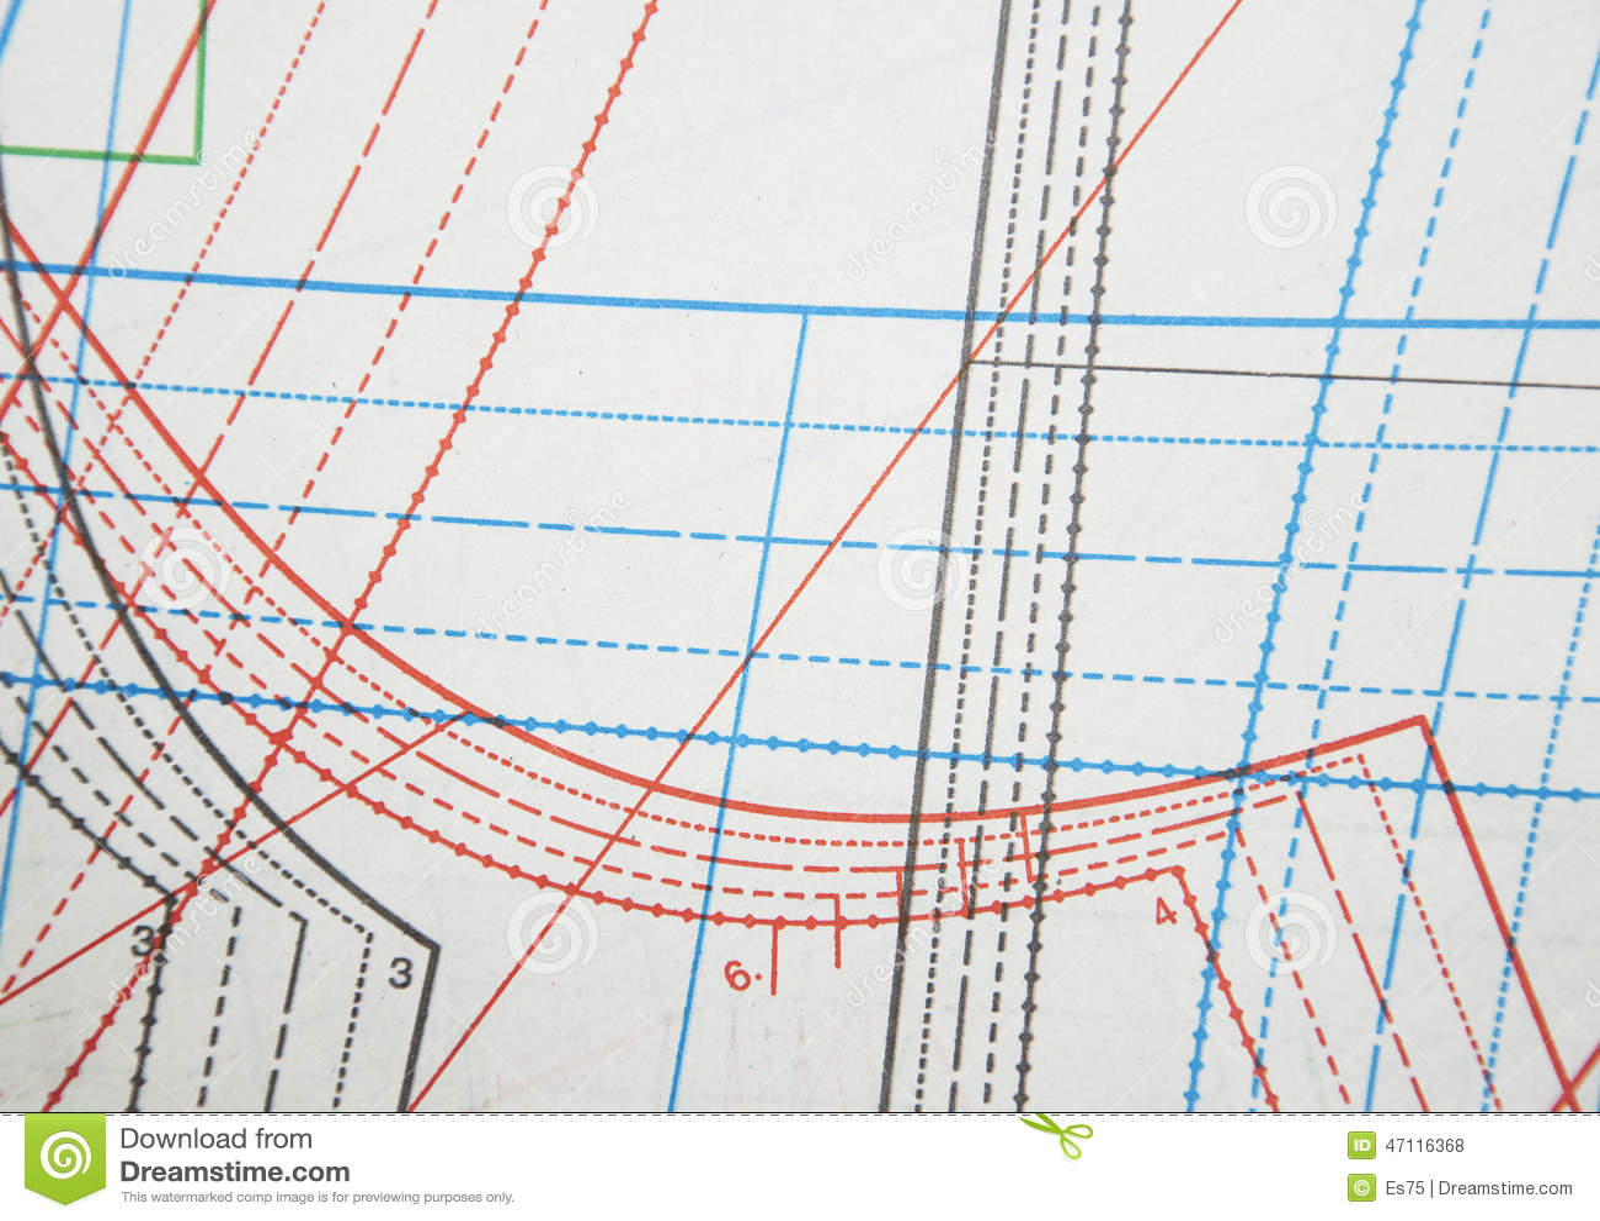 Professional Clothing Patterns Stock Photo Image Of Needlecraft Dotted 47116368